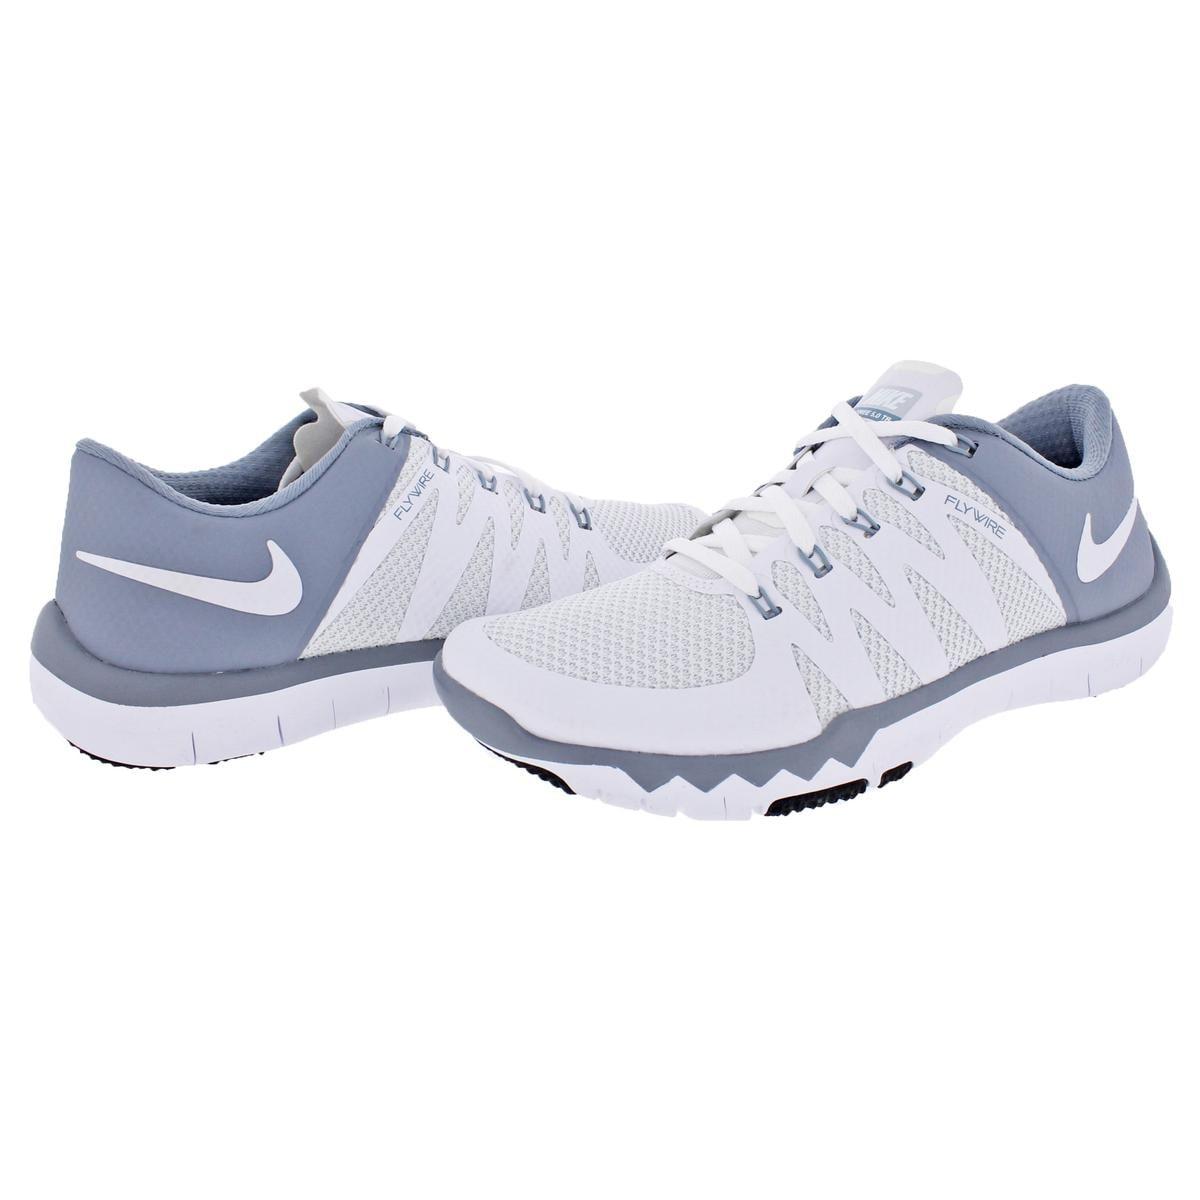 6b07db1d50636 Shop Nike Mens Free Trainer 5.0 V6 Running